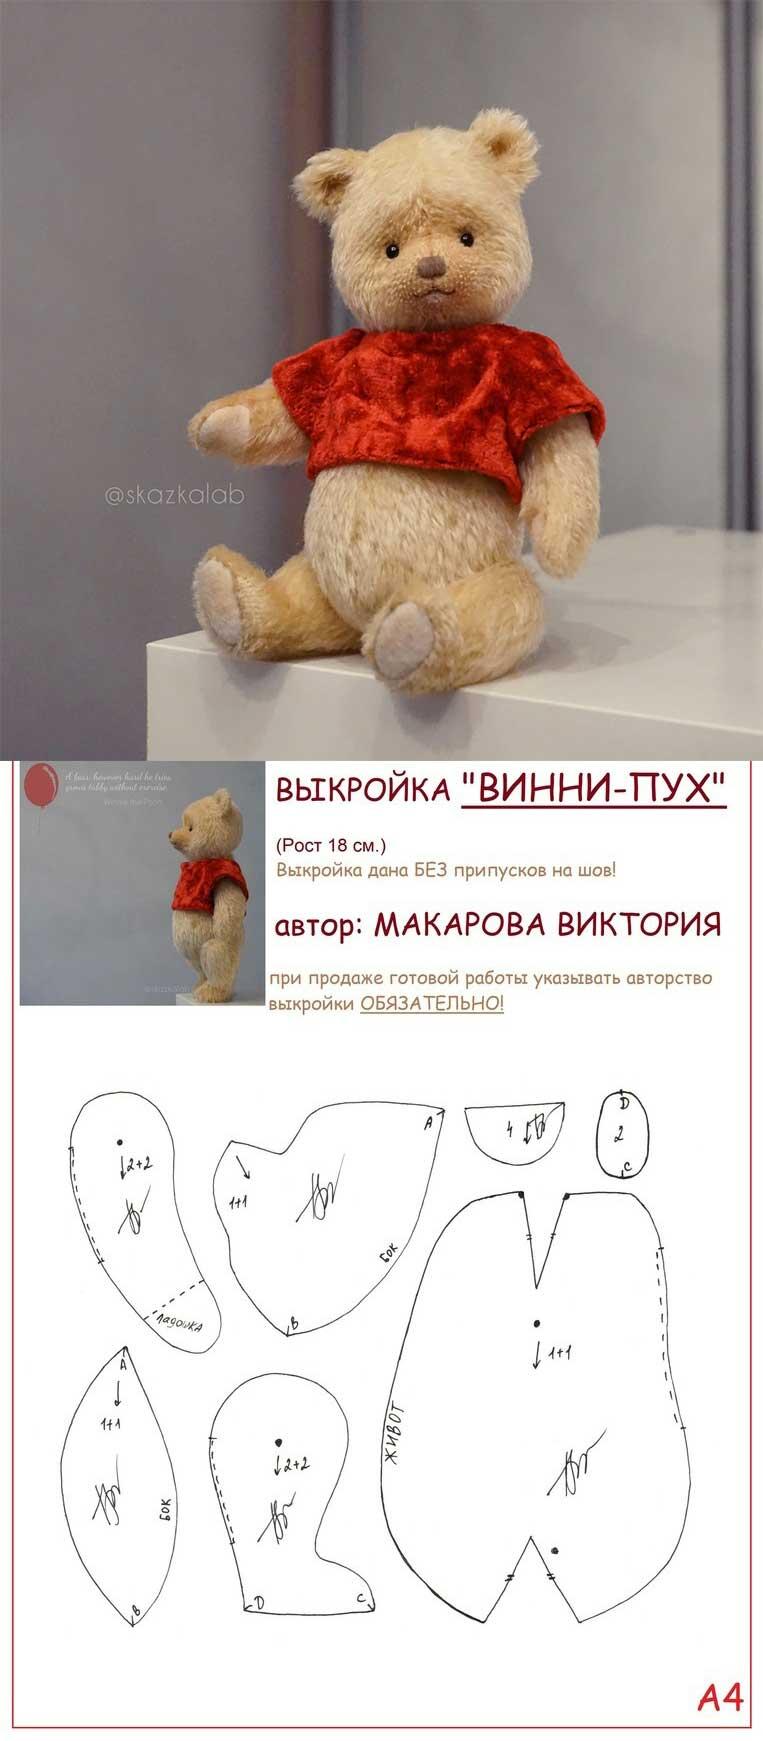 moldes Oso Winnie the Pooh para imprimir